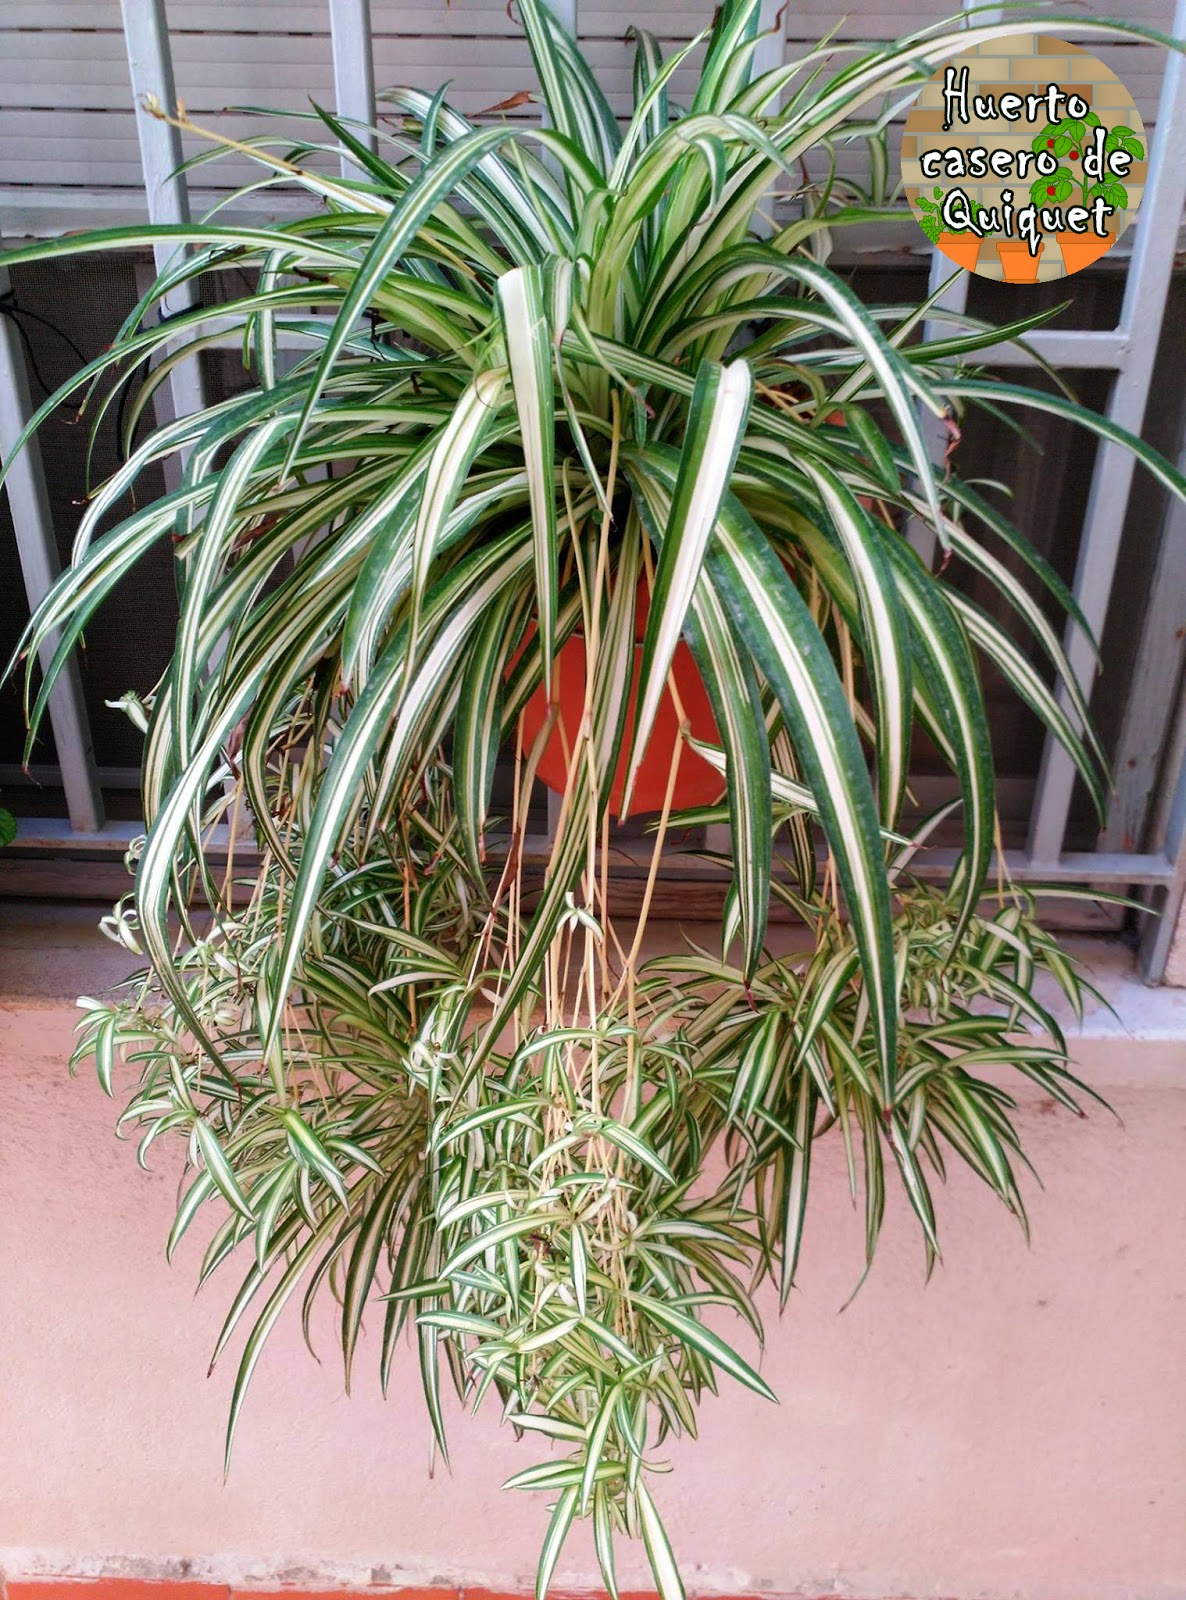 Huerto casero de quiquet planta cintas ara a o - Plantas de interior cintas ...